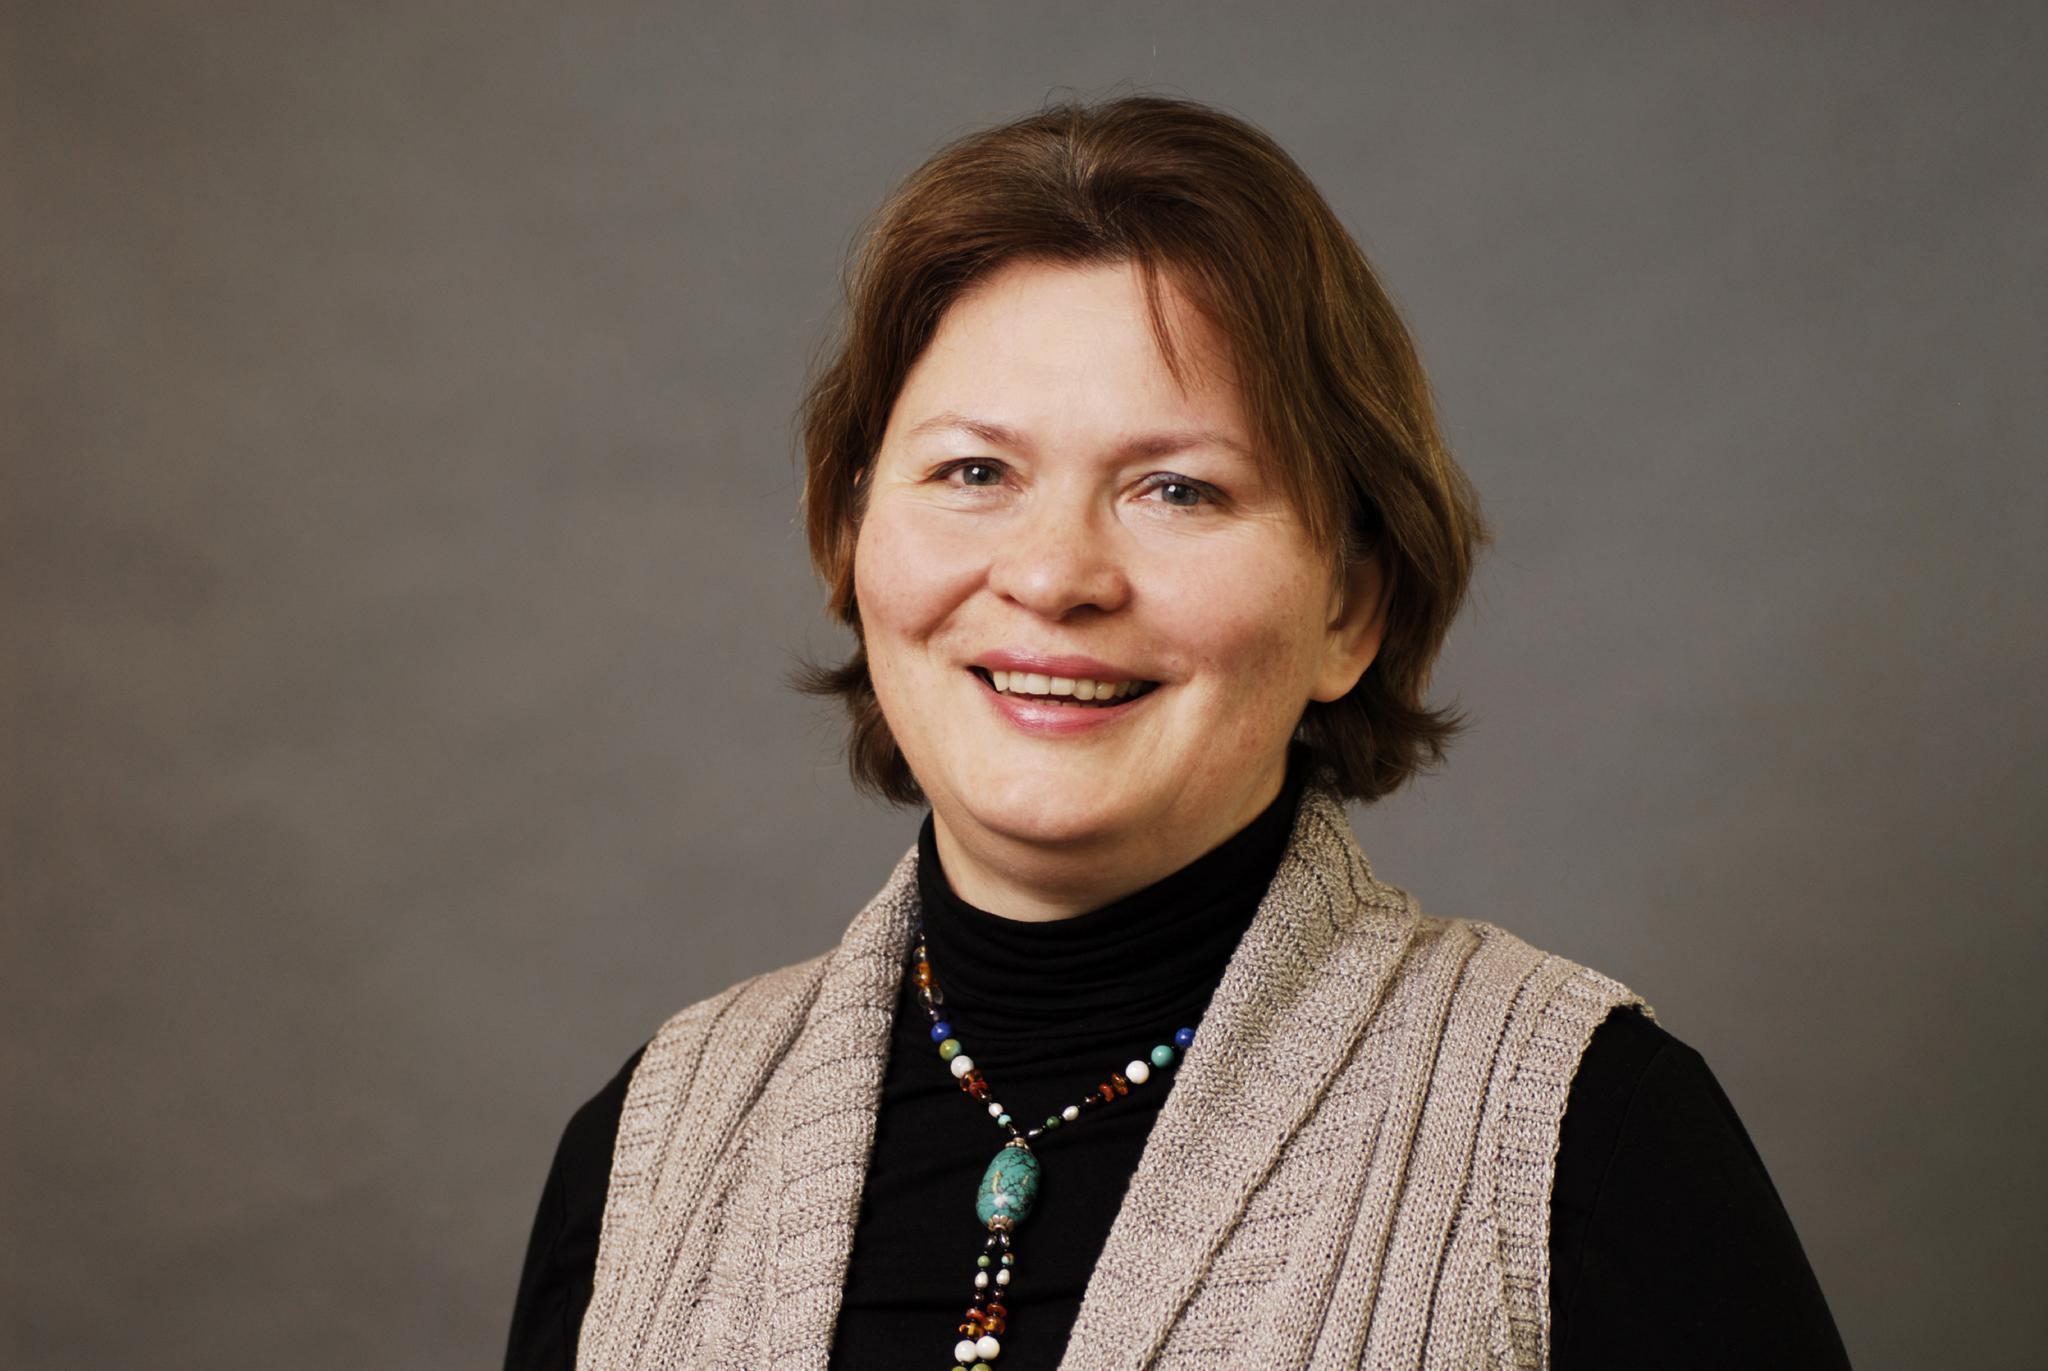 REFERENTIN DER WOCHE: PROF. DR. ANDREA TIPOLD